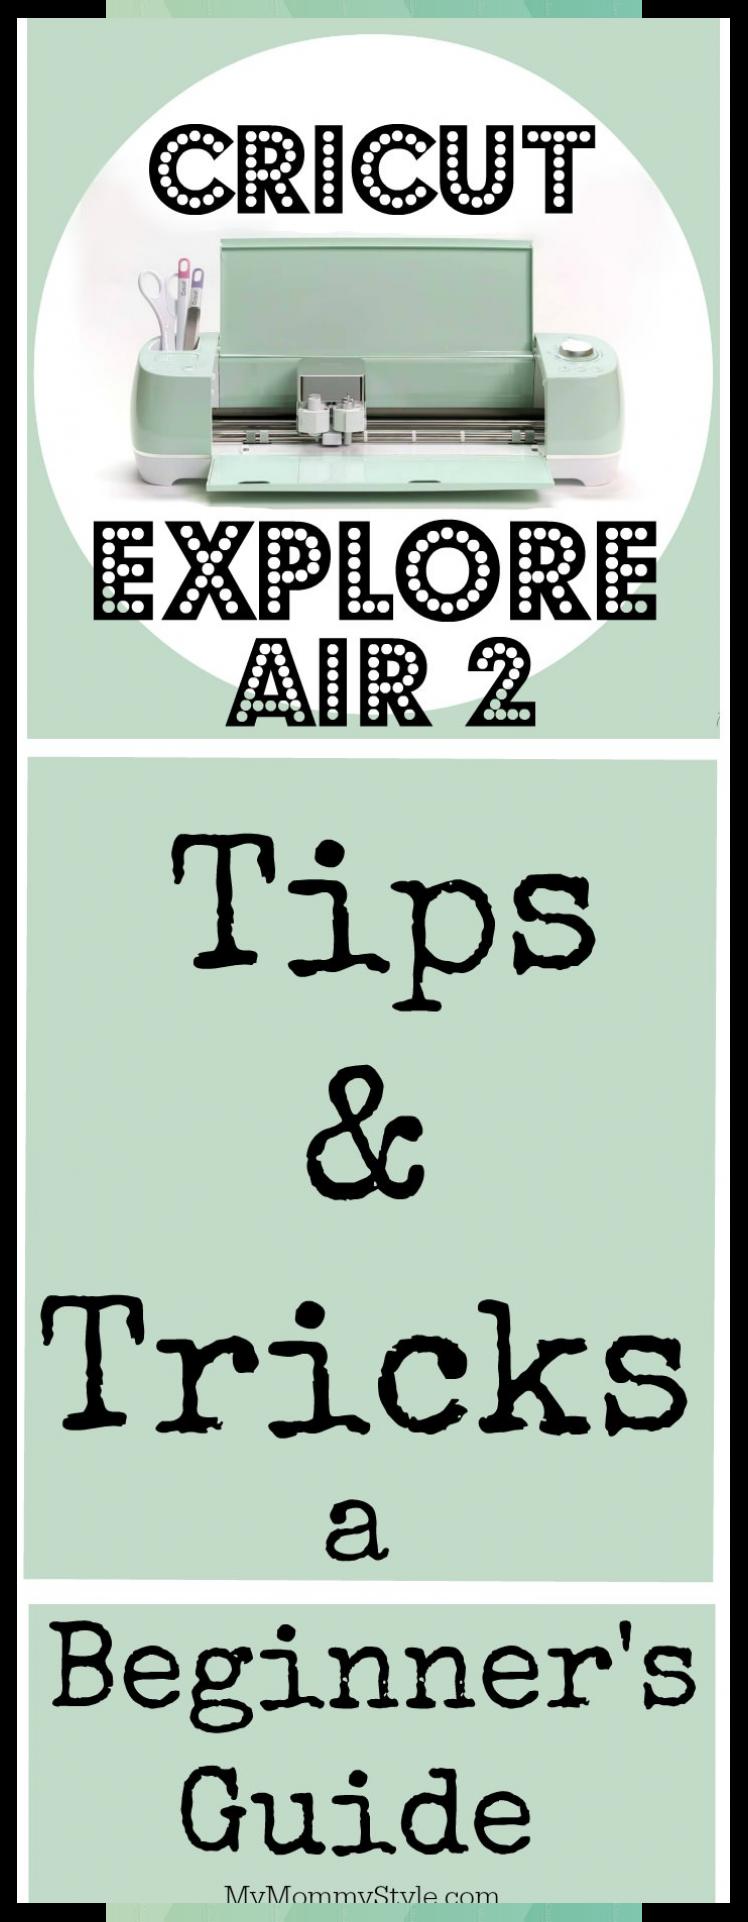 Cricut Explore Air 2 Tips and Tricks A Beginner's Guide